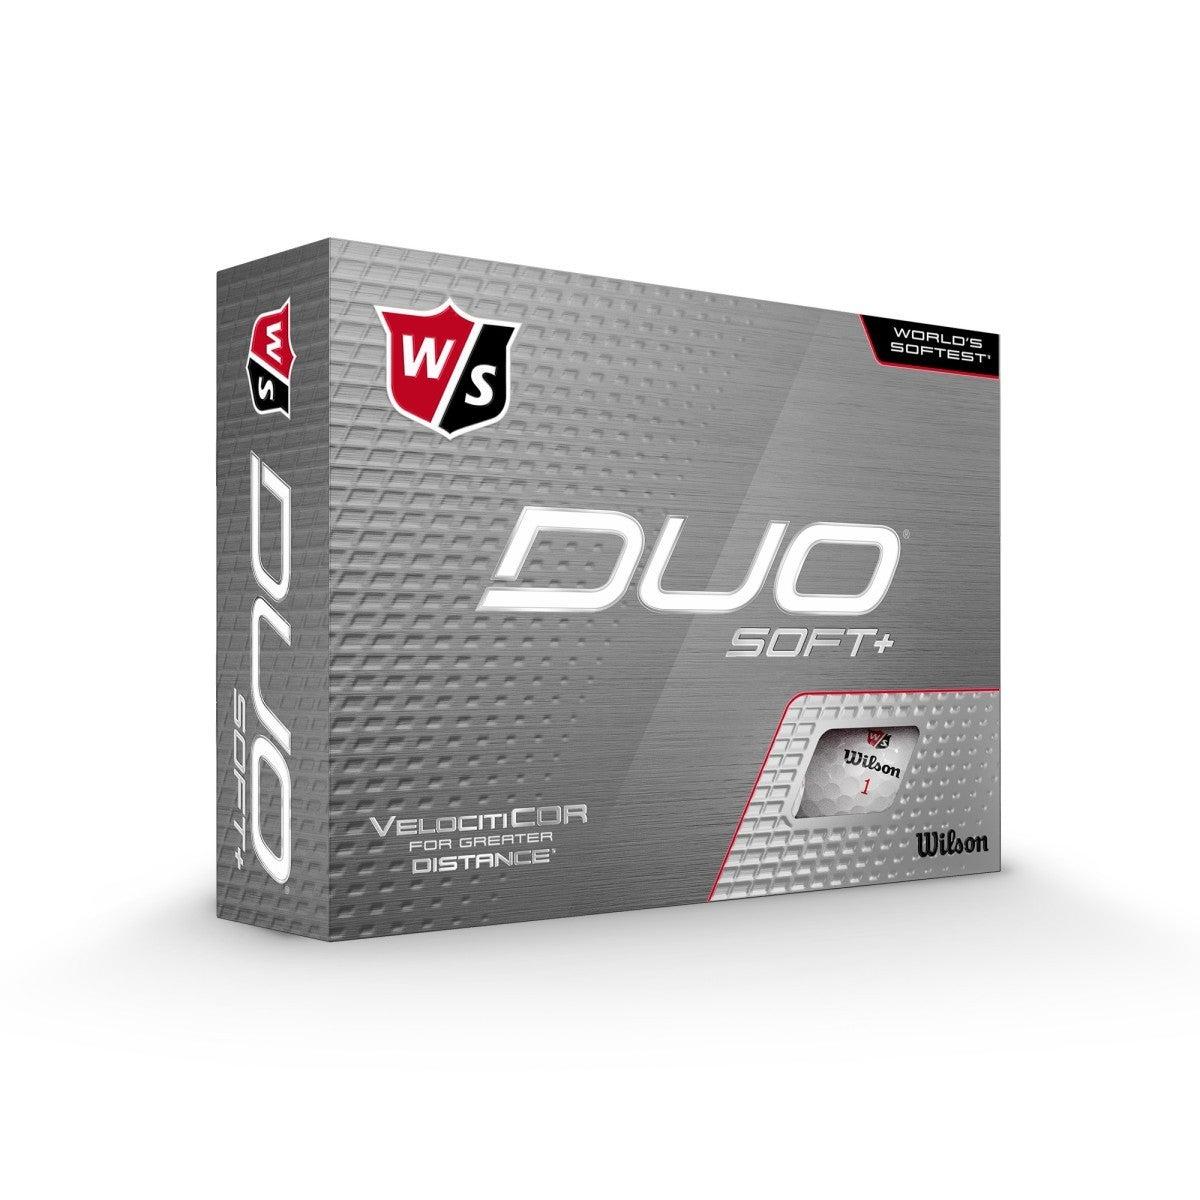 Duo Soft+ Golfbälle, weiß